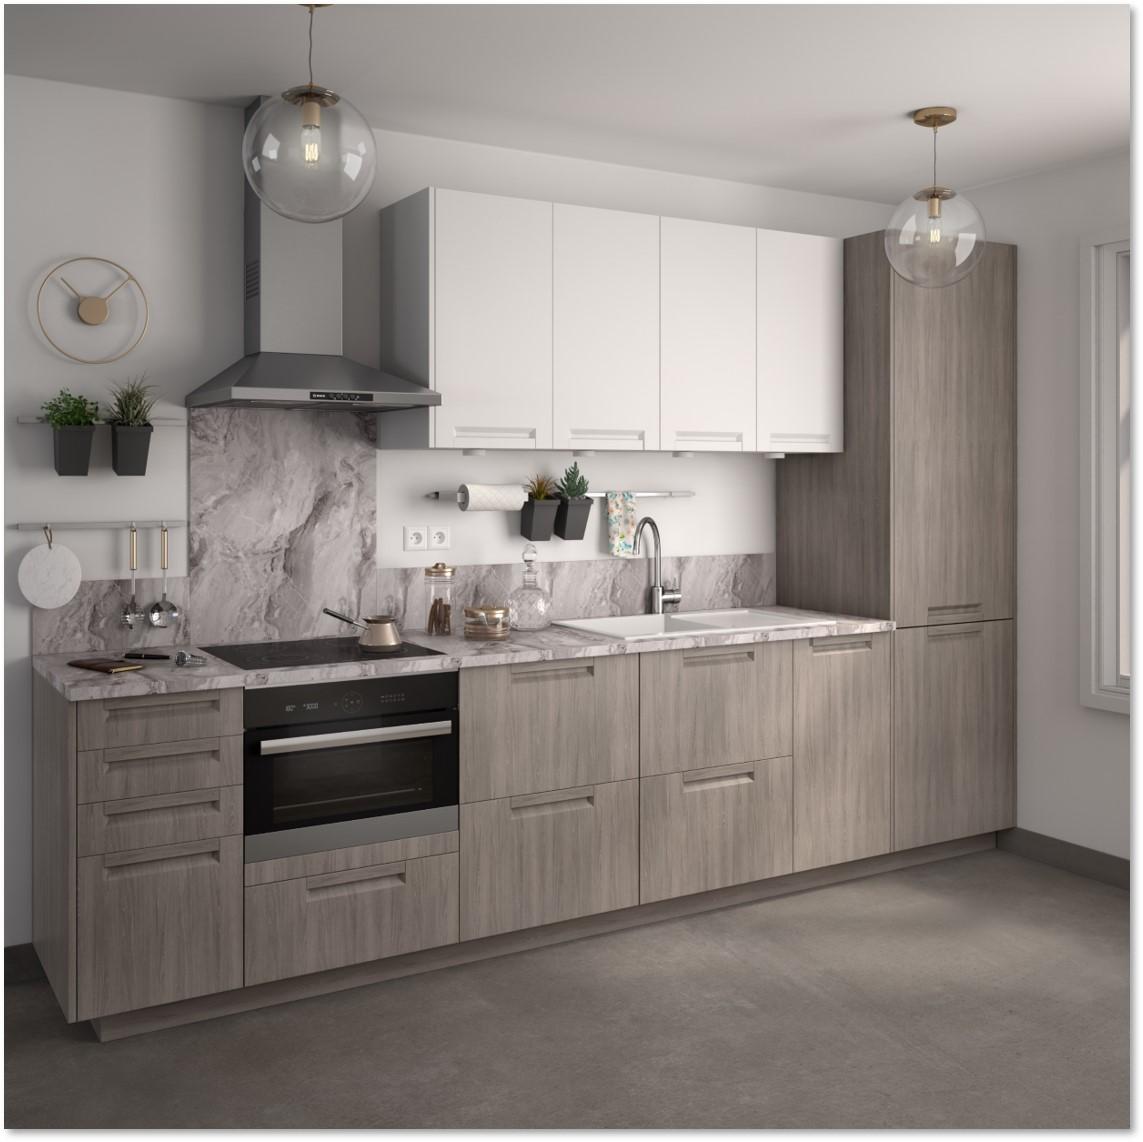 Delinia Detroit Designer Kitchen - Example 1